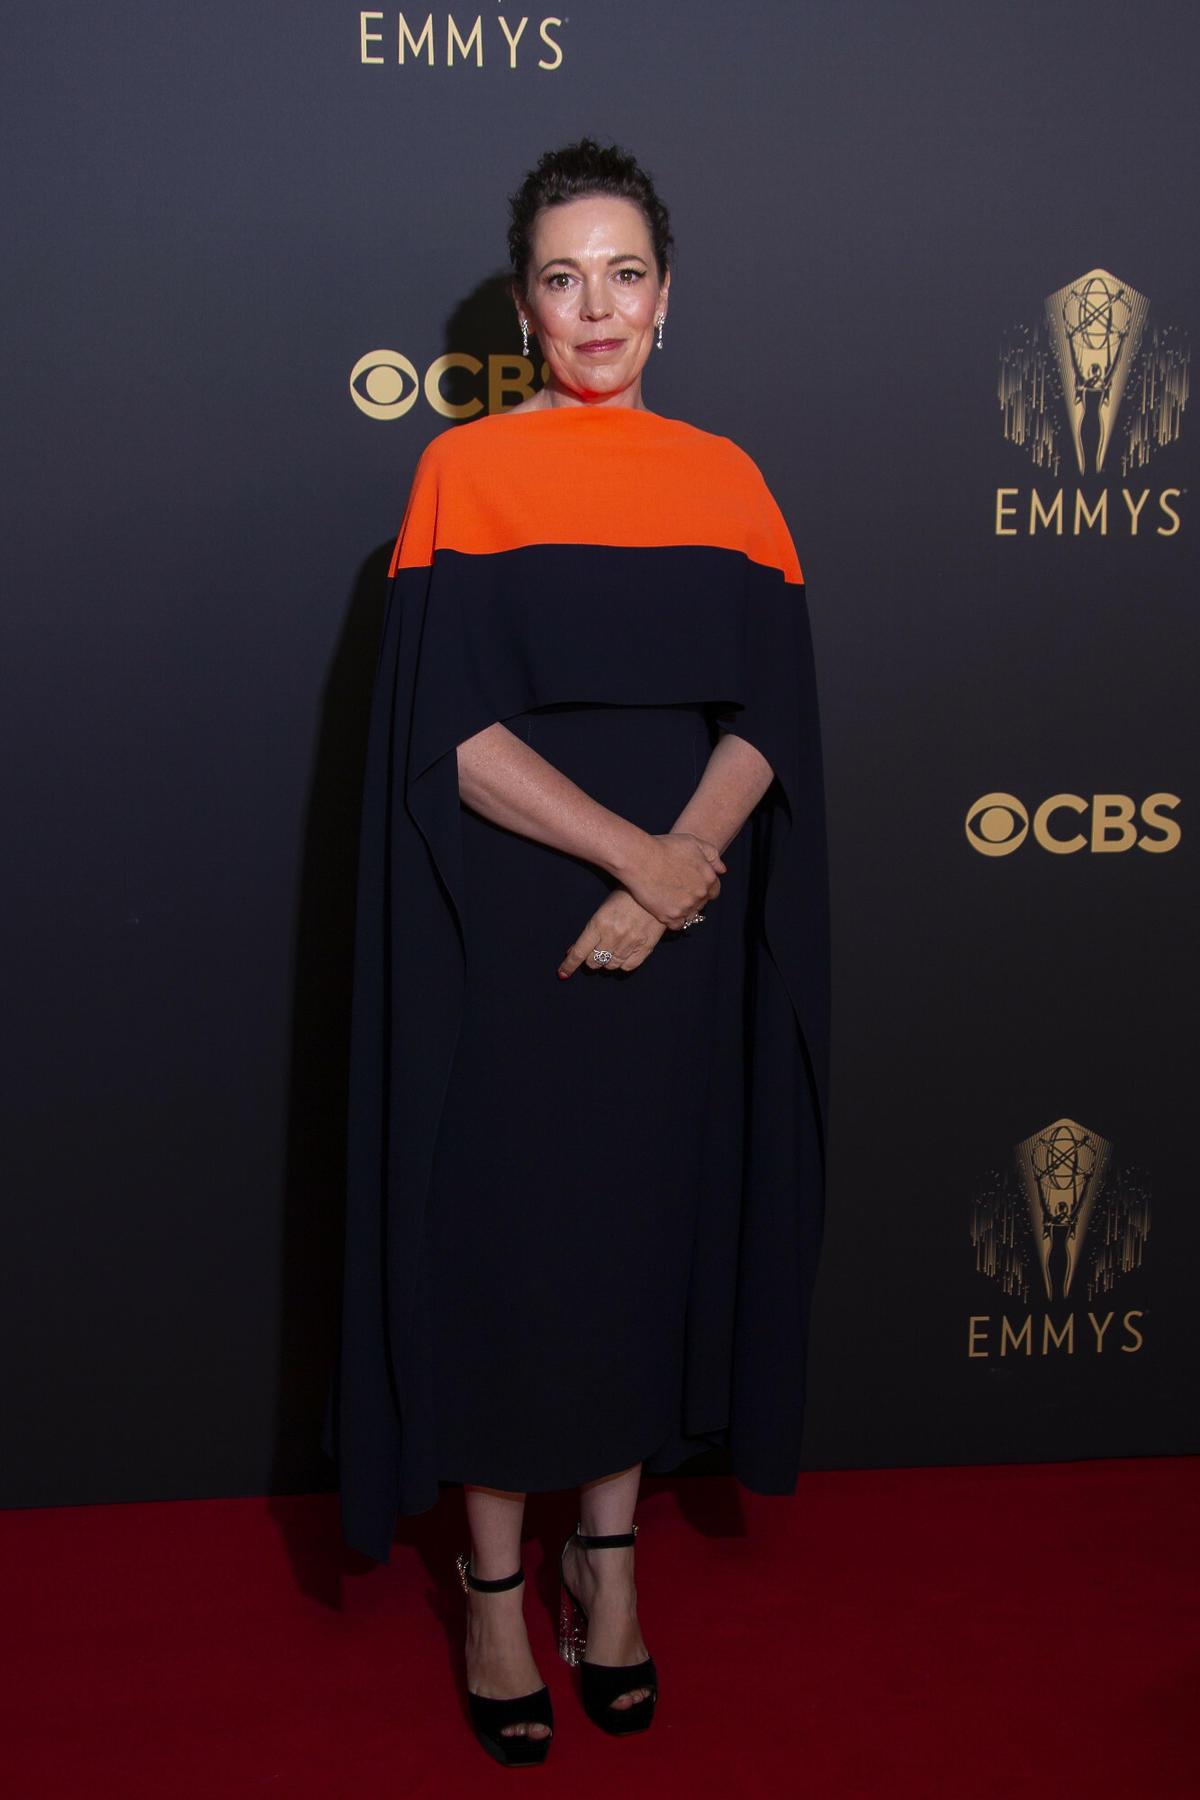 Oliwia Colman na Emmy 2021